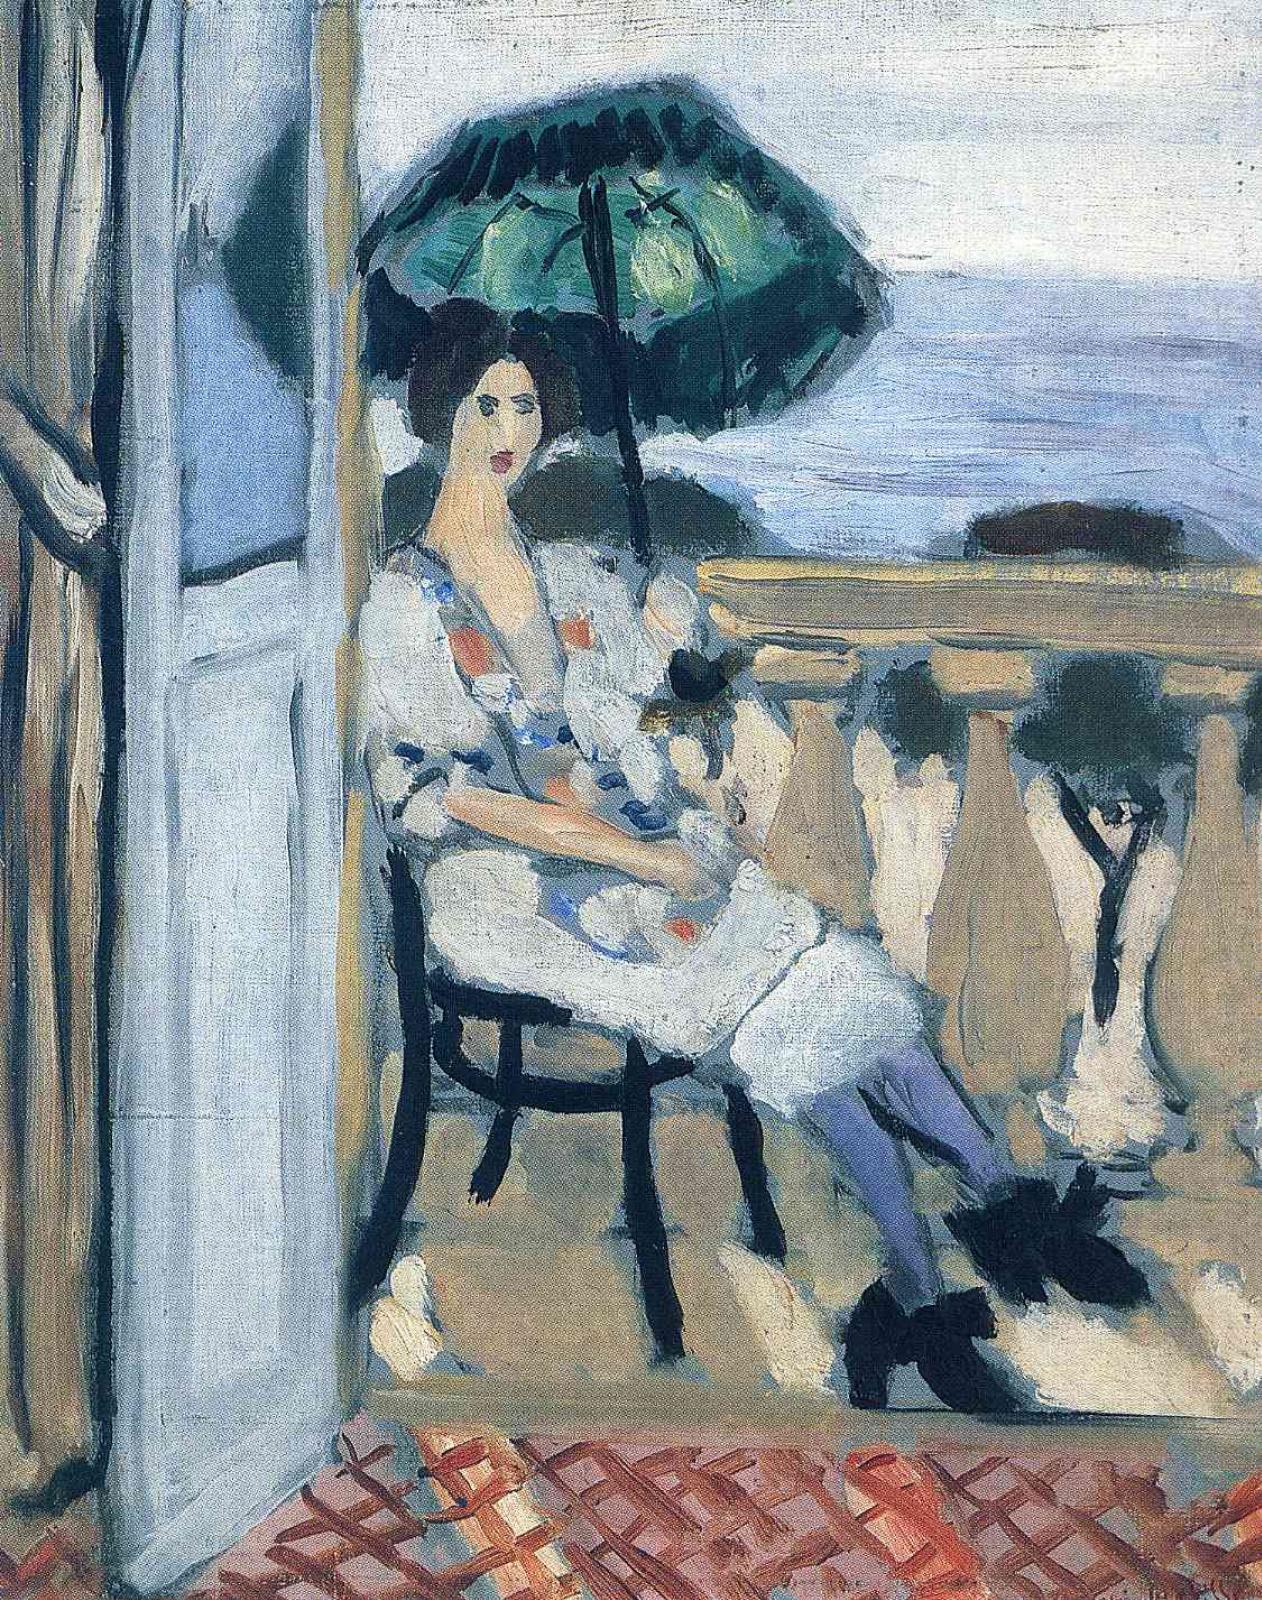 Анри Матисс. Женщина, держащая зонтик